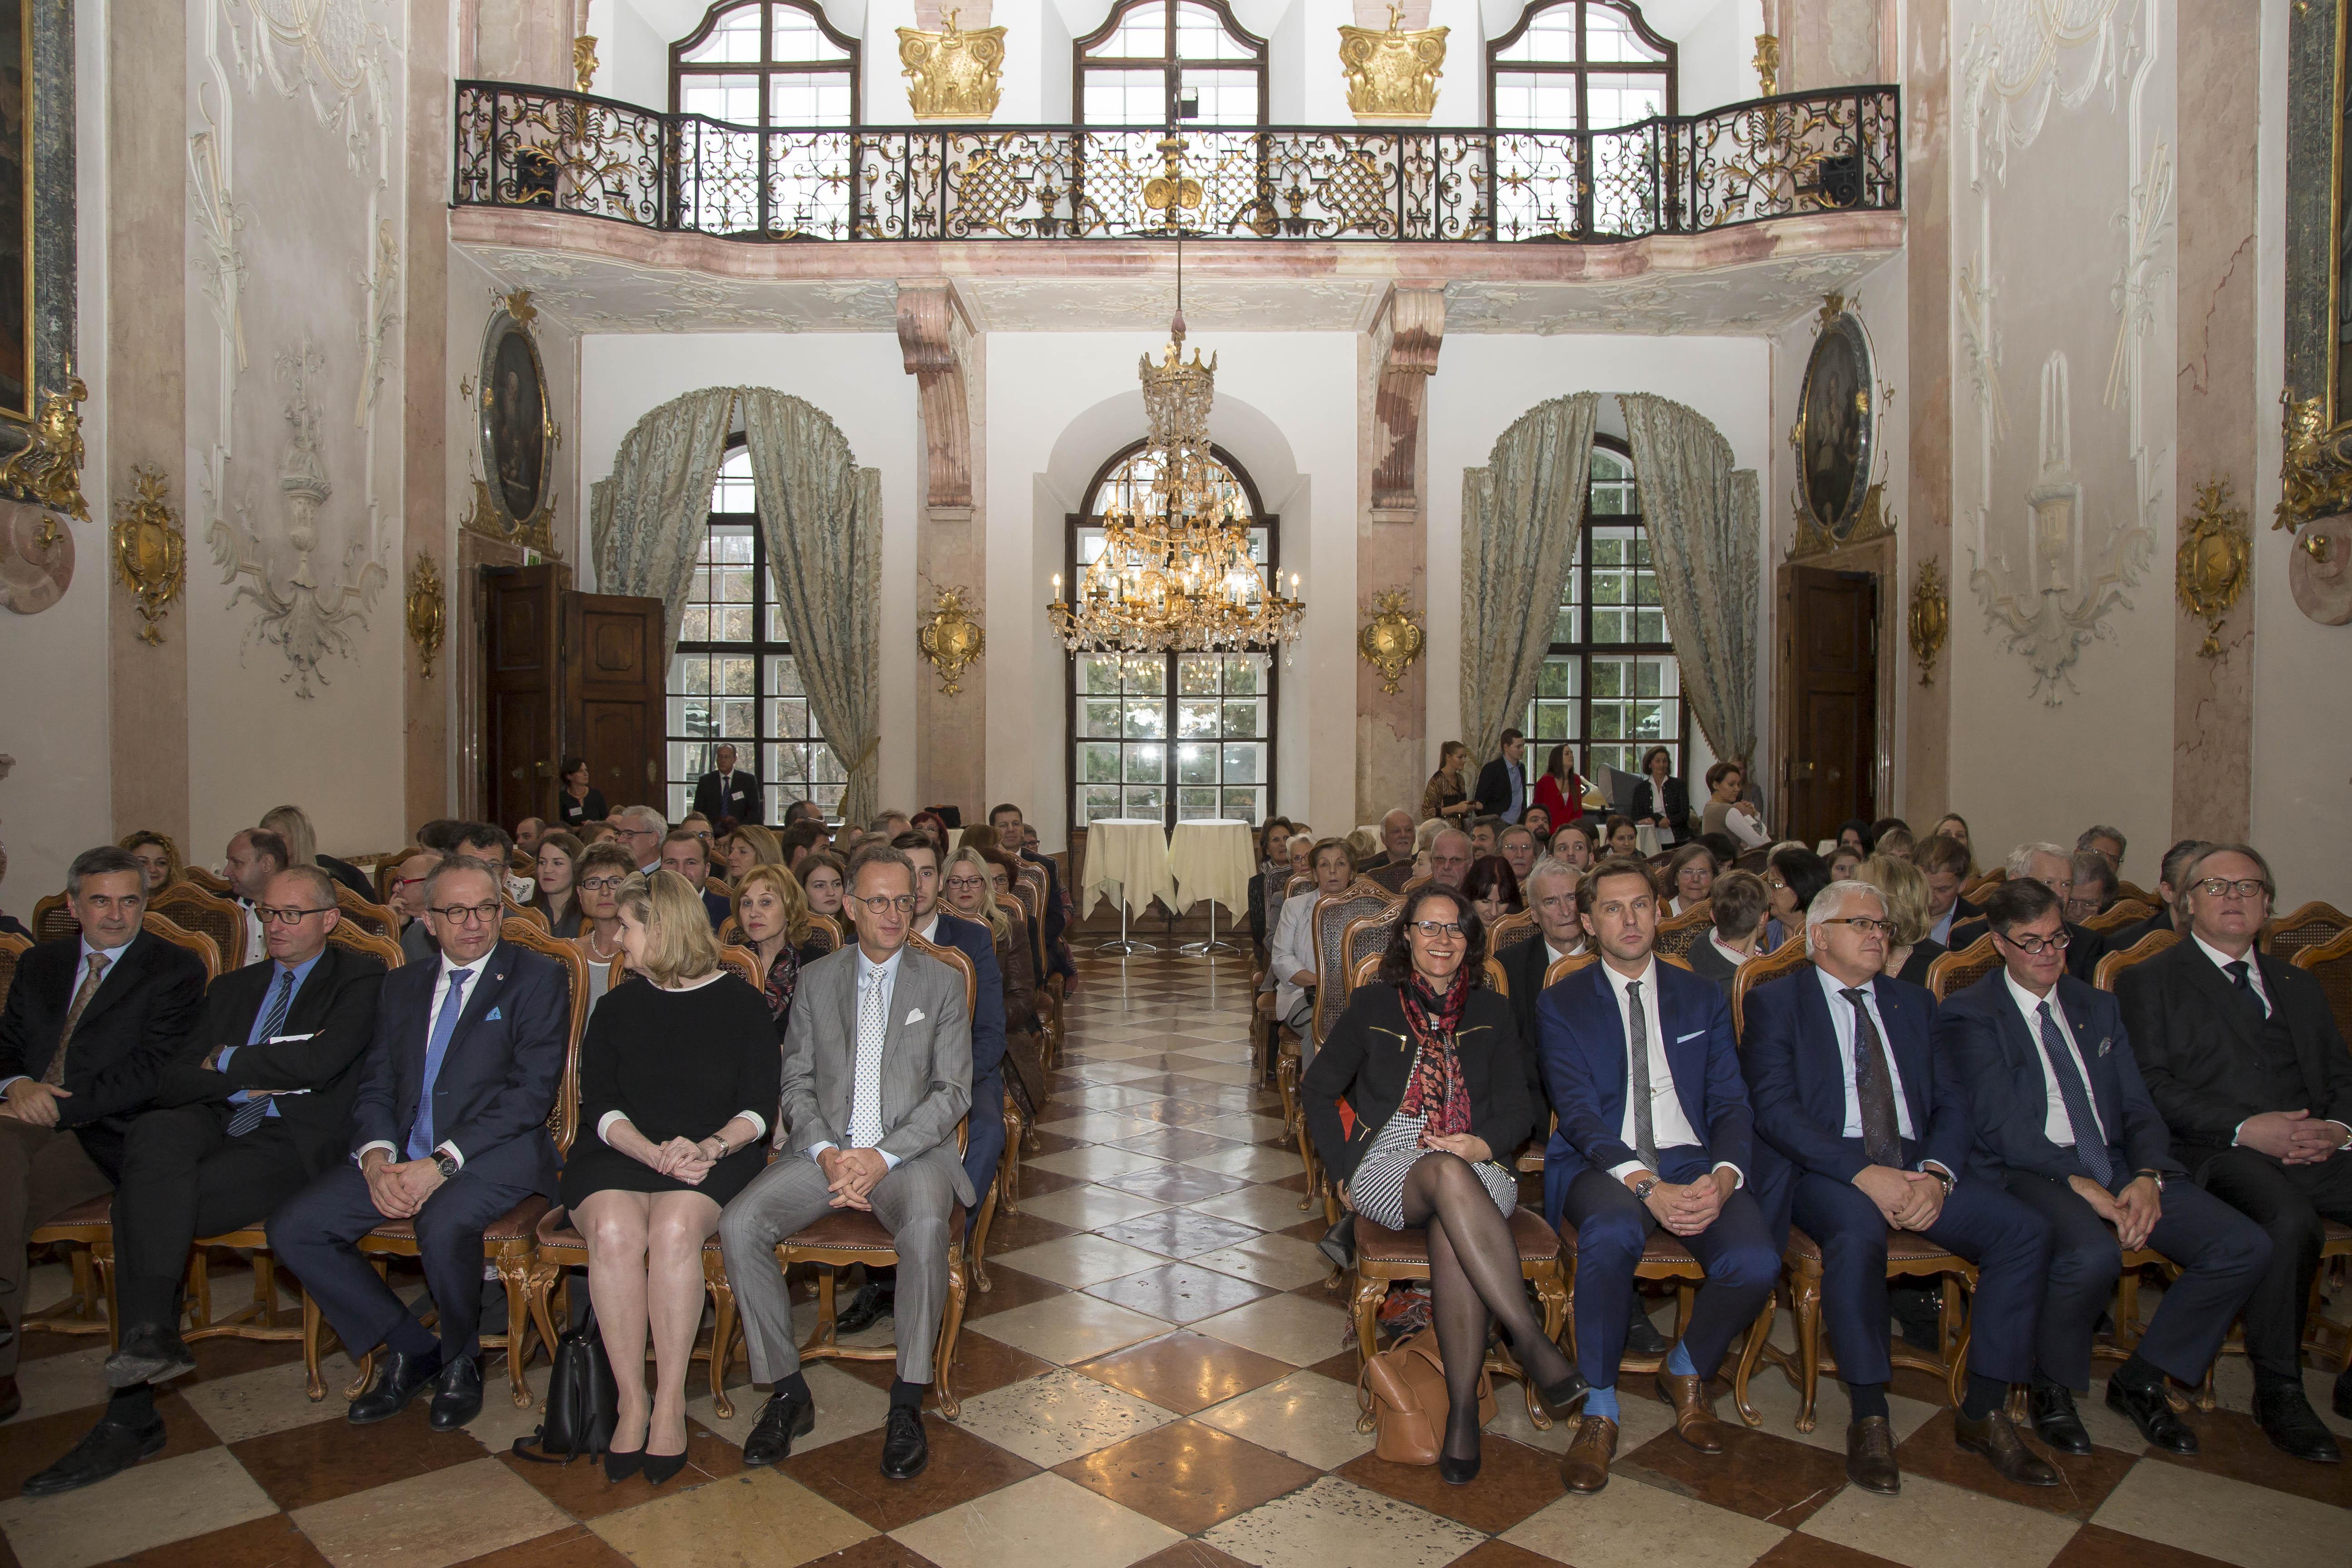 Graduierungsfeier ifm im Schloss Leopoldskron. Foto: Andreas Kolarik, 25.11.16